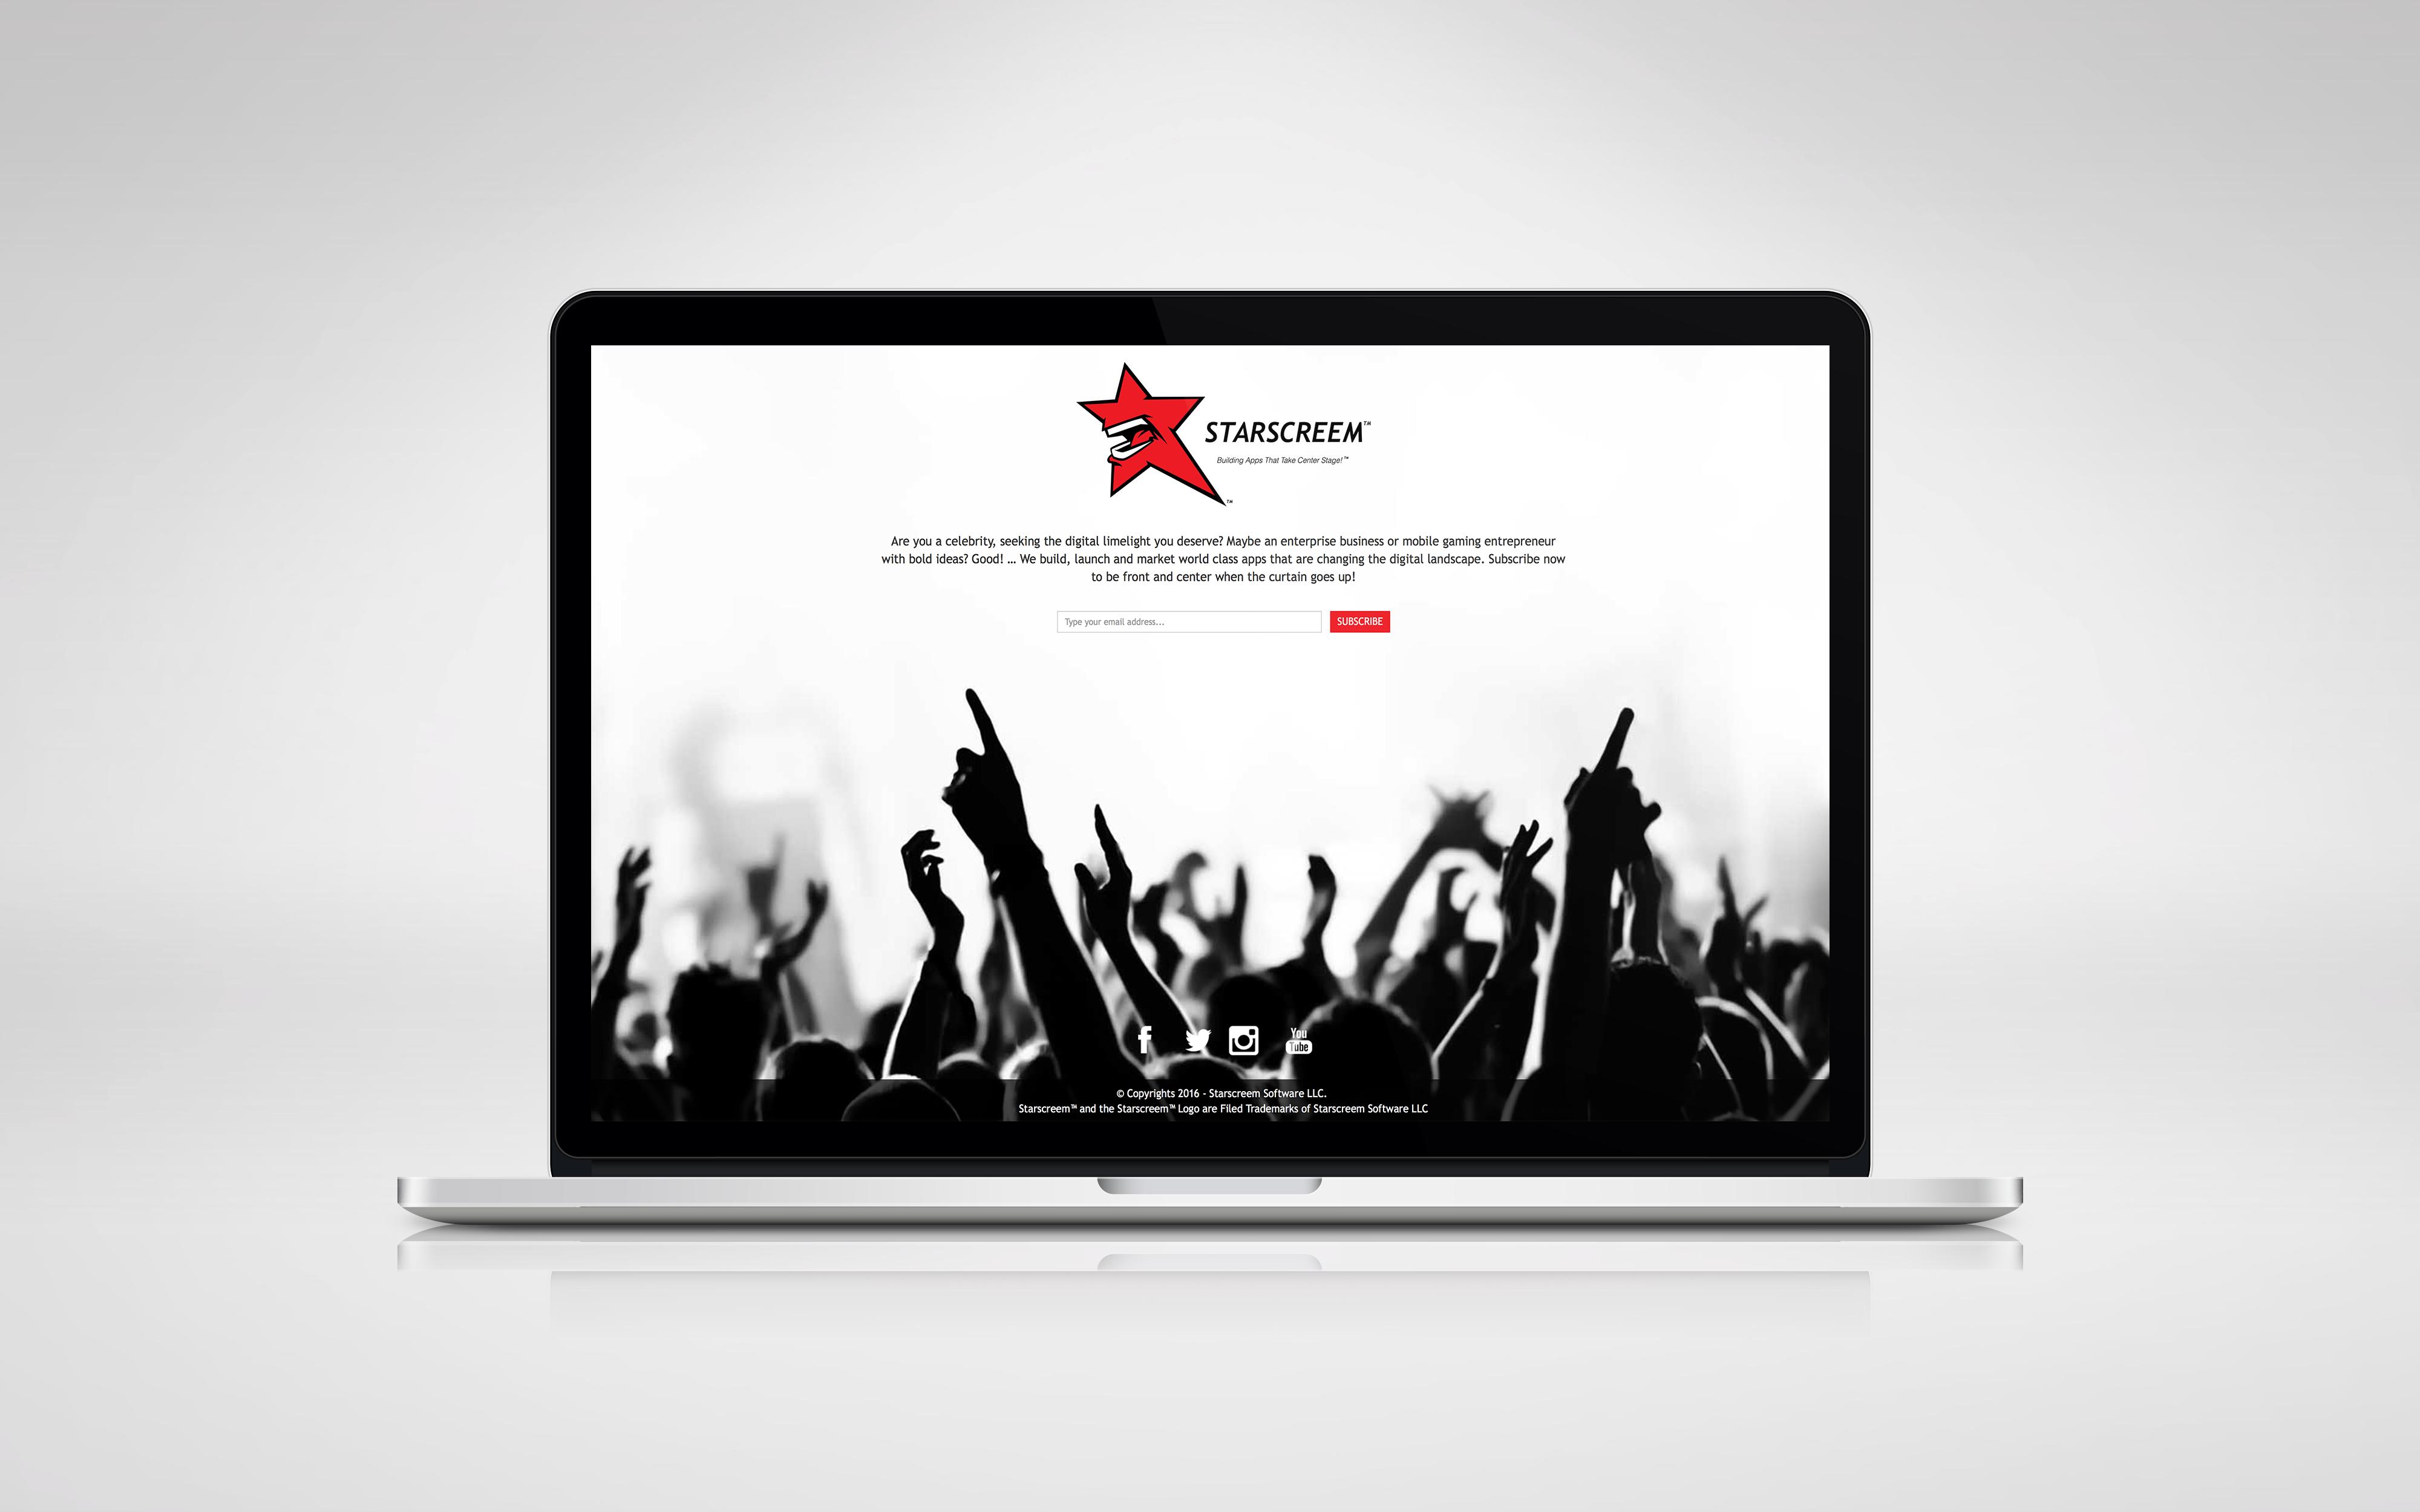 Starscreem_Website_Laptop